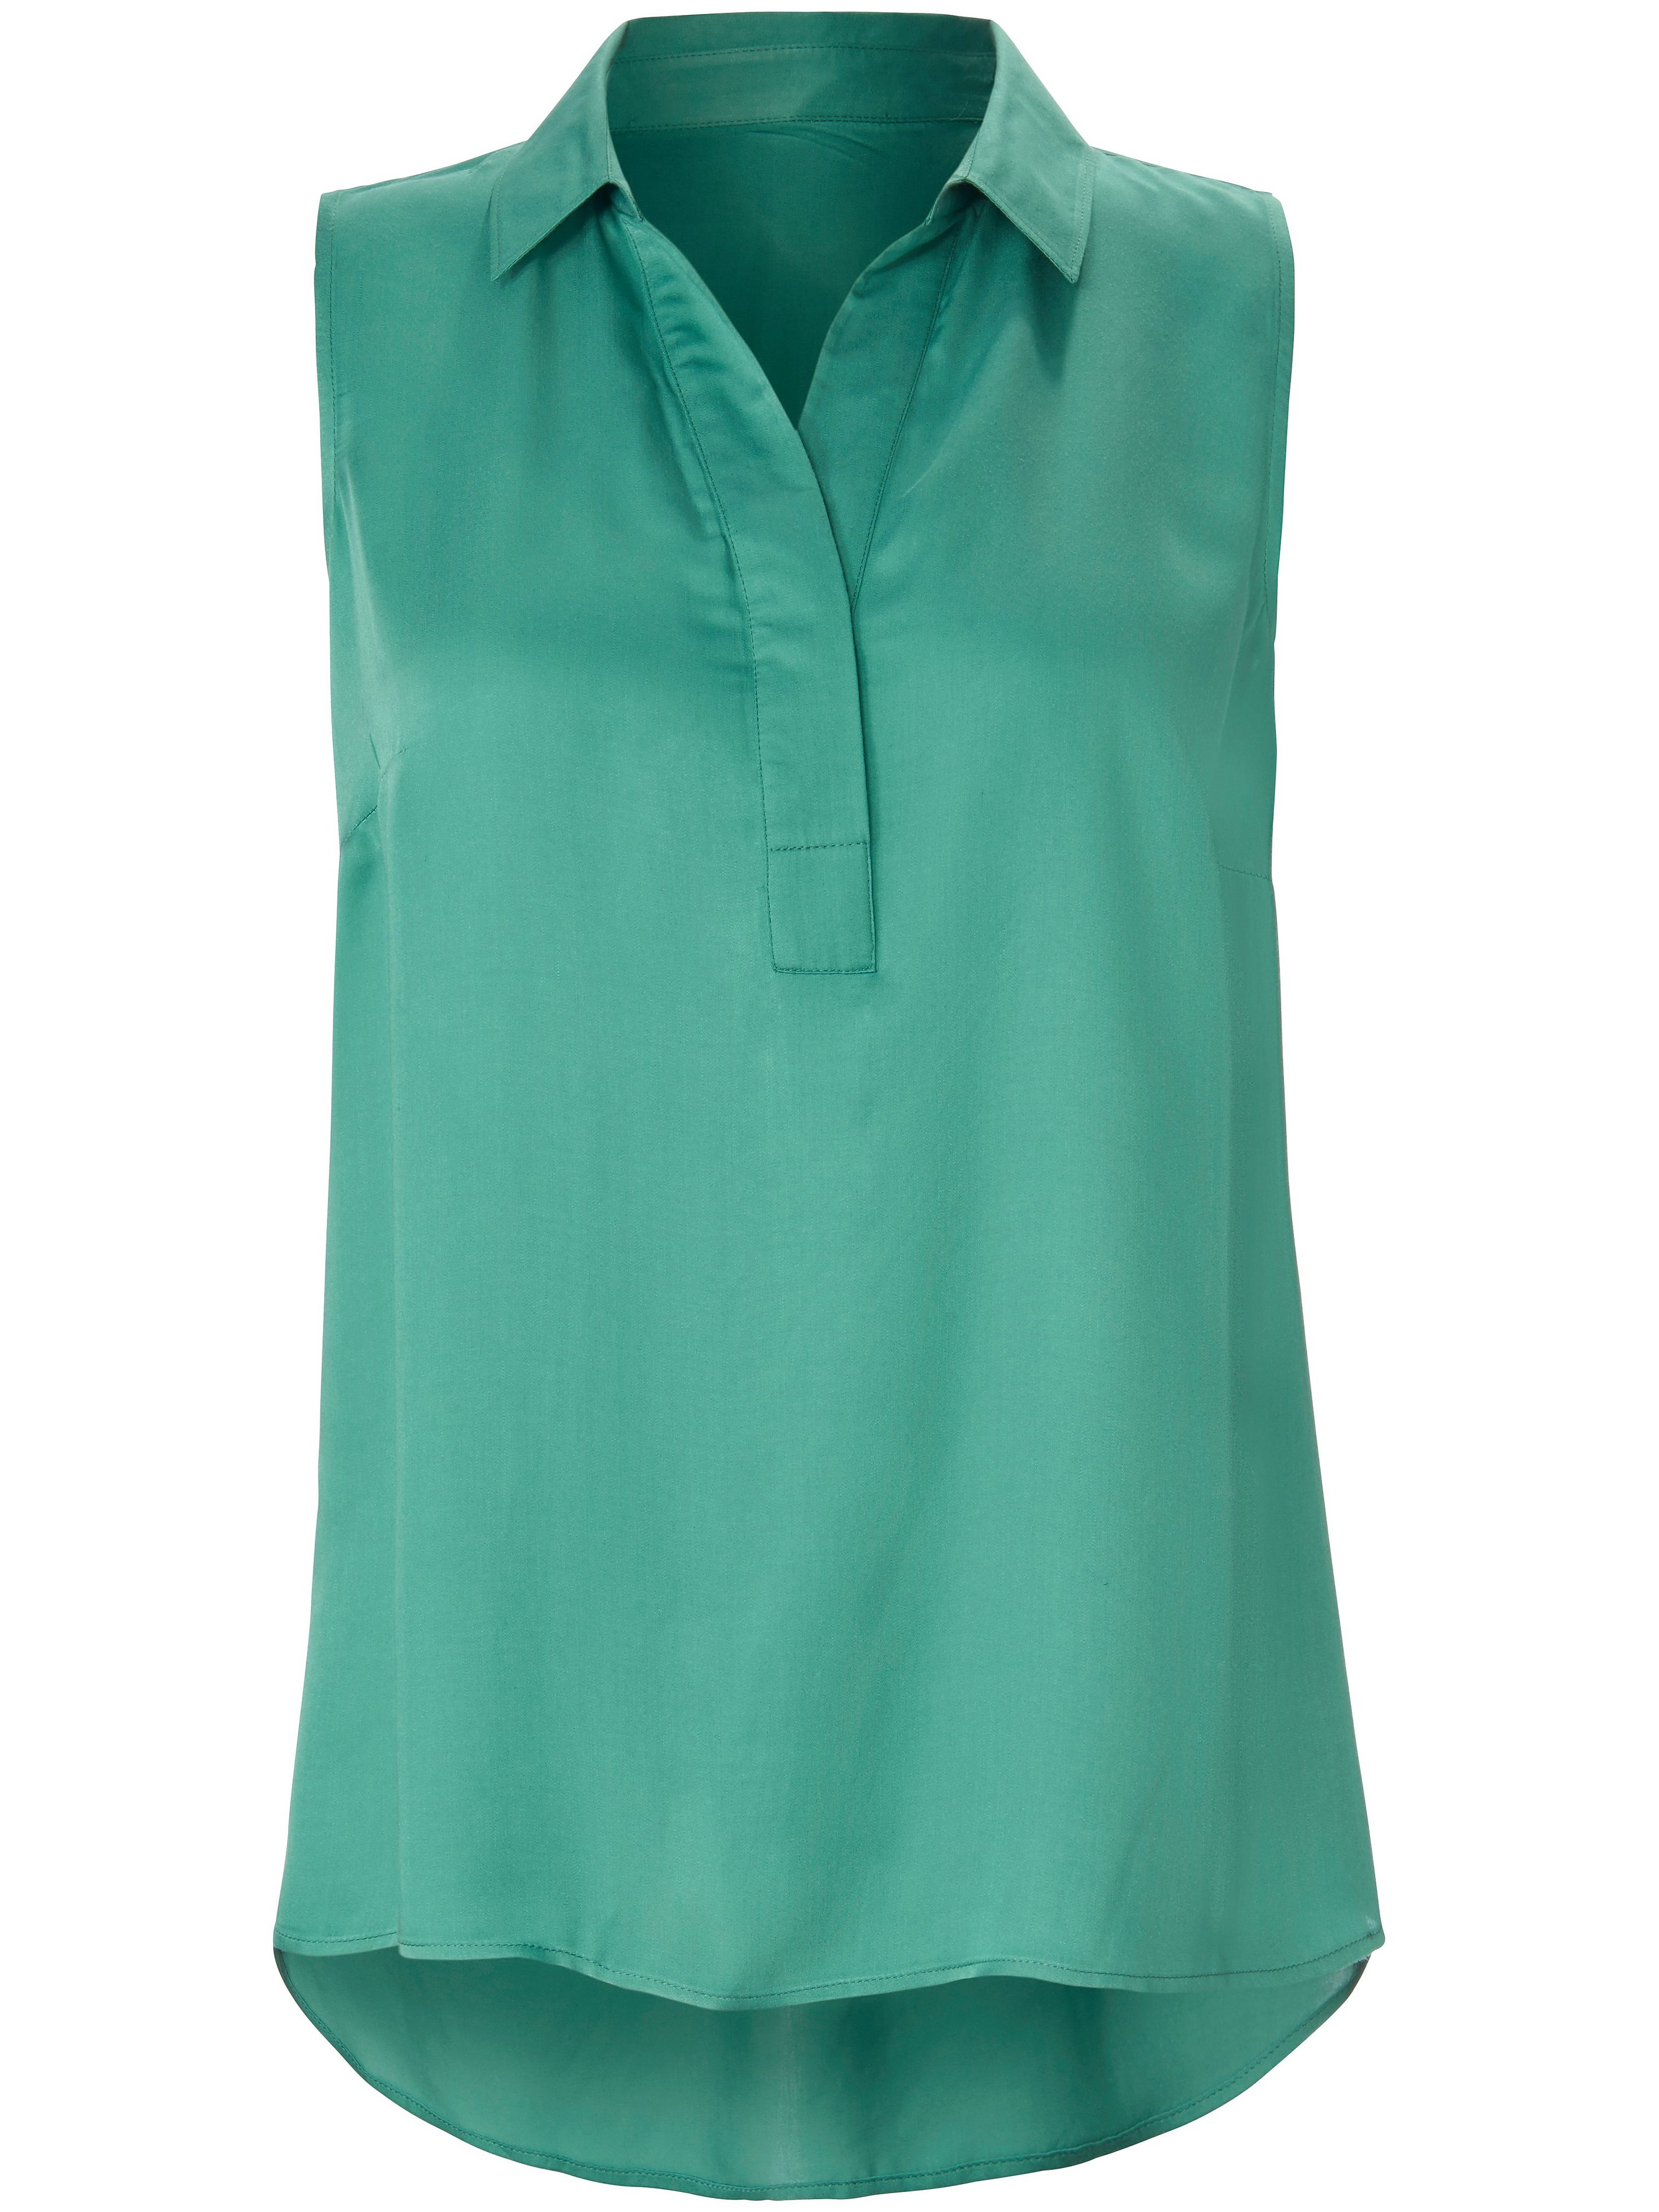 Mouwloze blouse overhemdkraag Van Emilia Lay groen